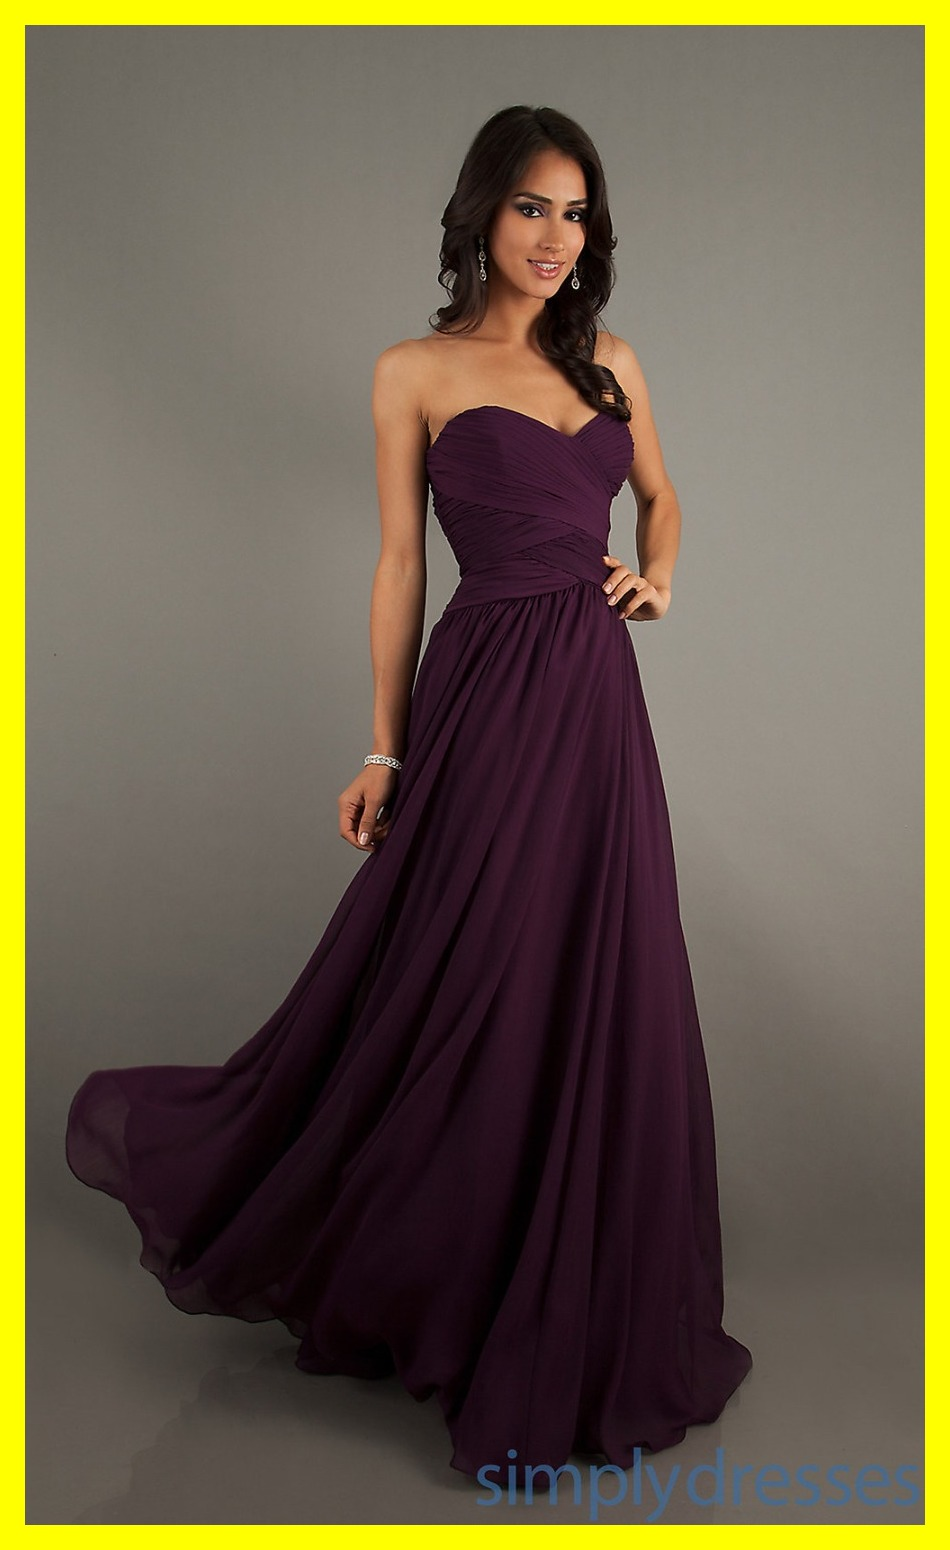 Maroon wedding dresses overlay wedding dresses maroon wedding dresses 113 ombrellifo Choice Image